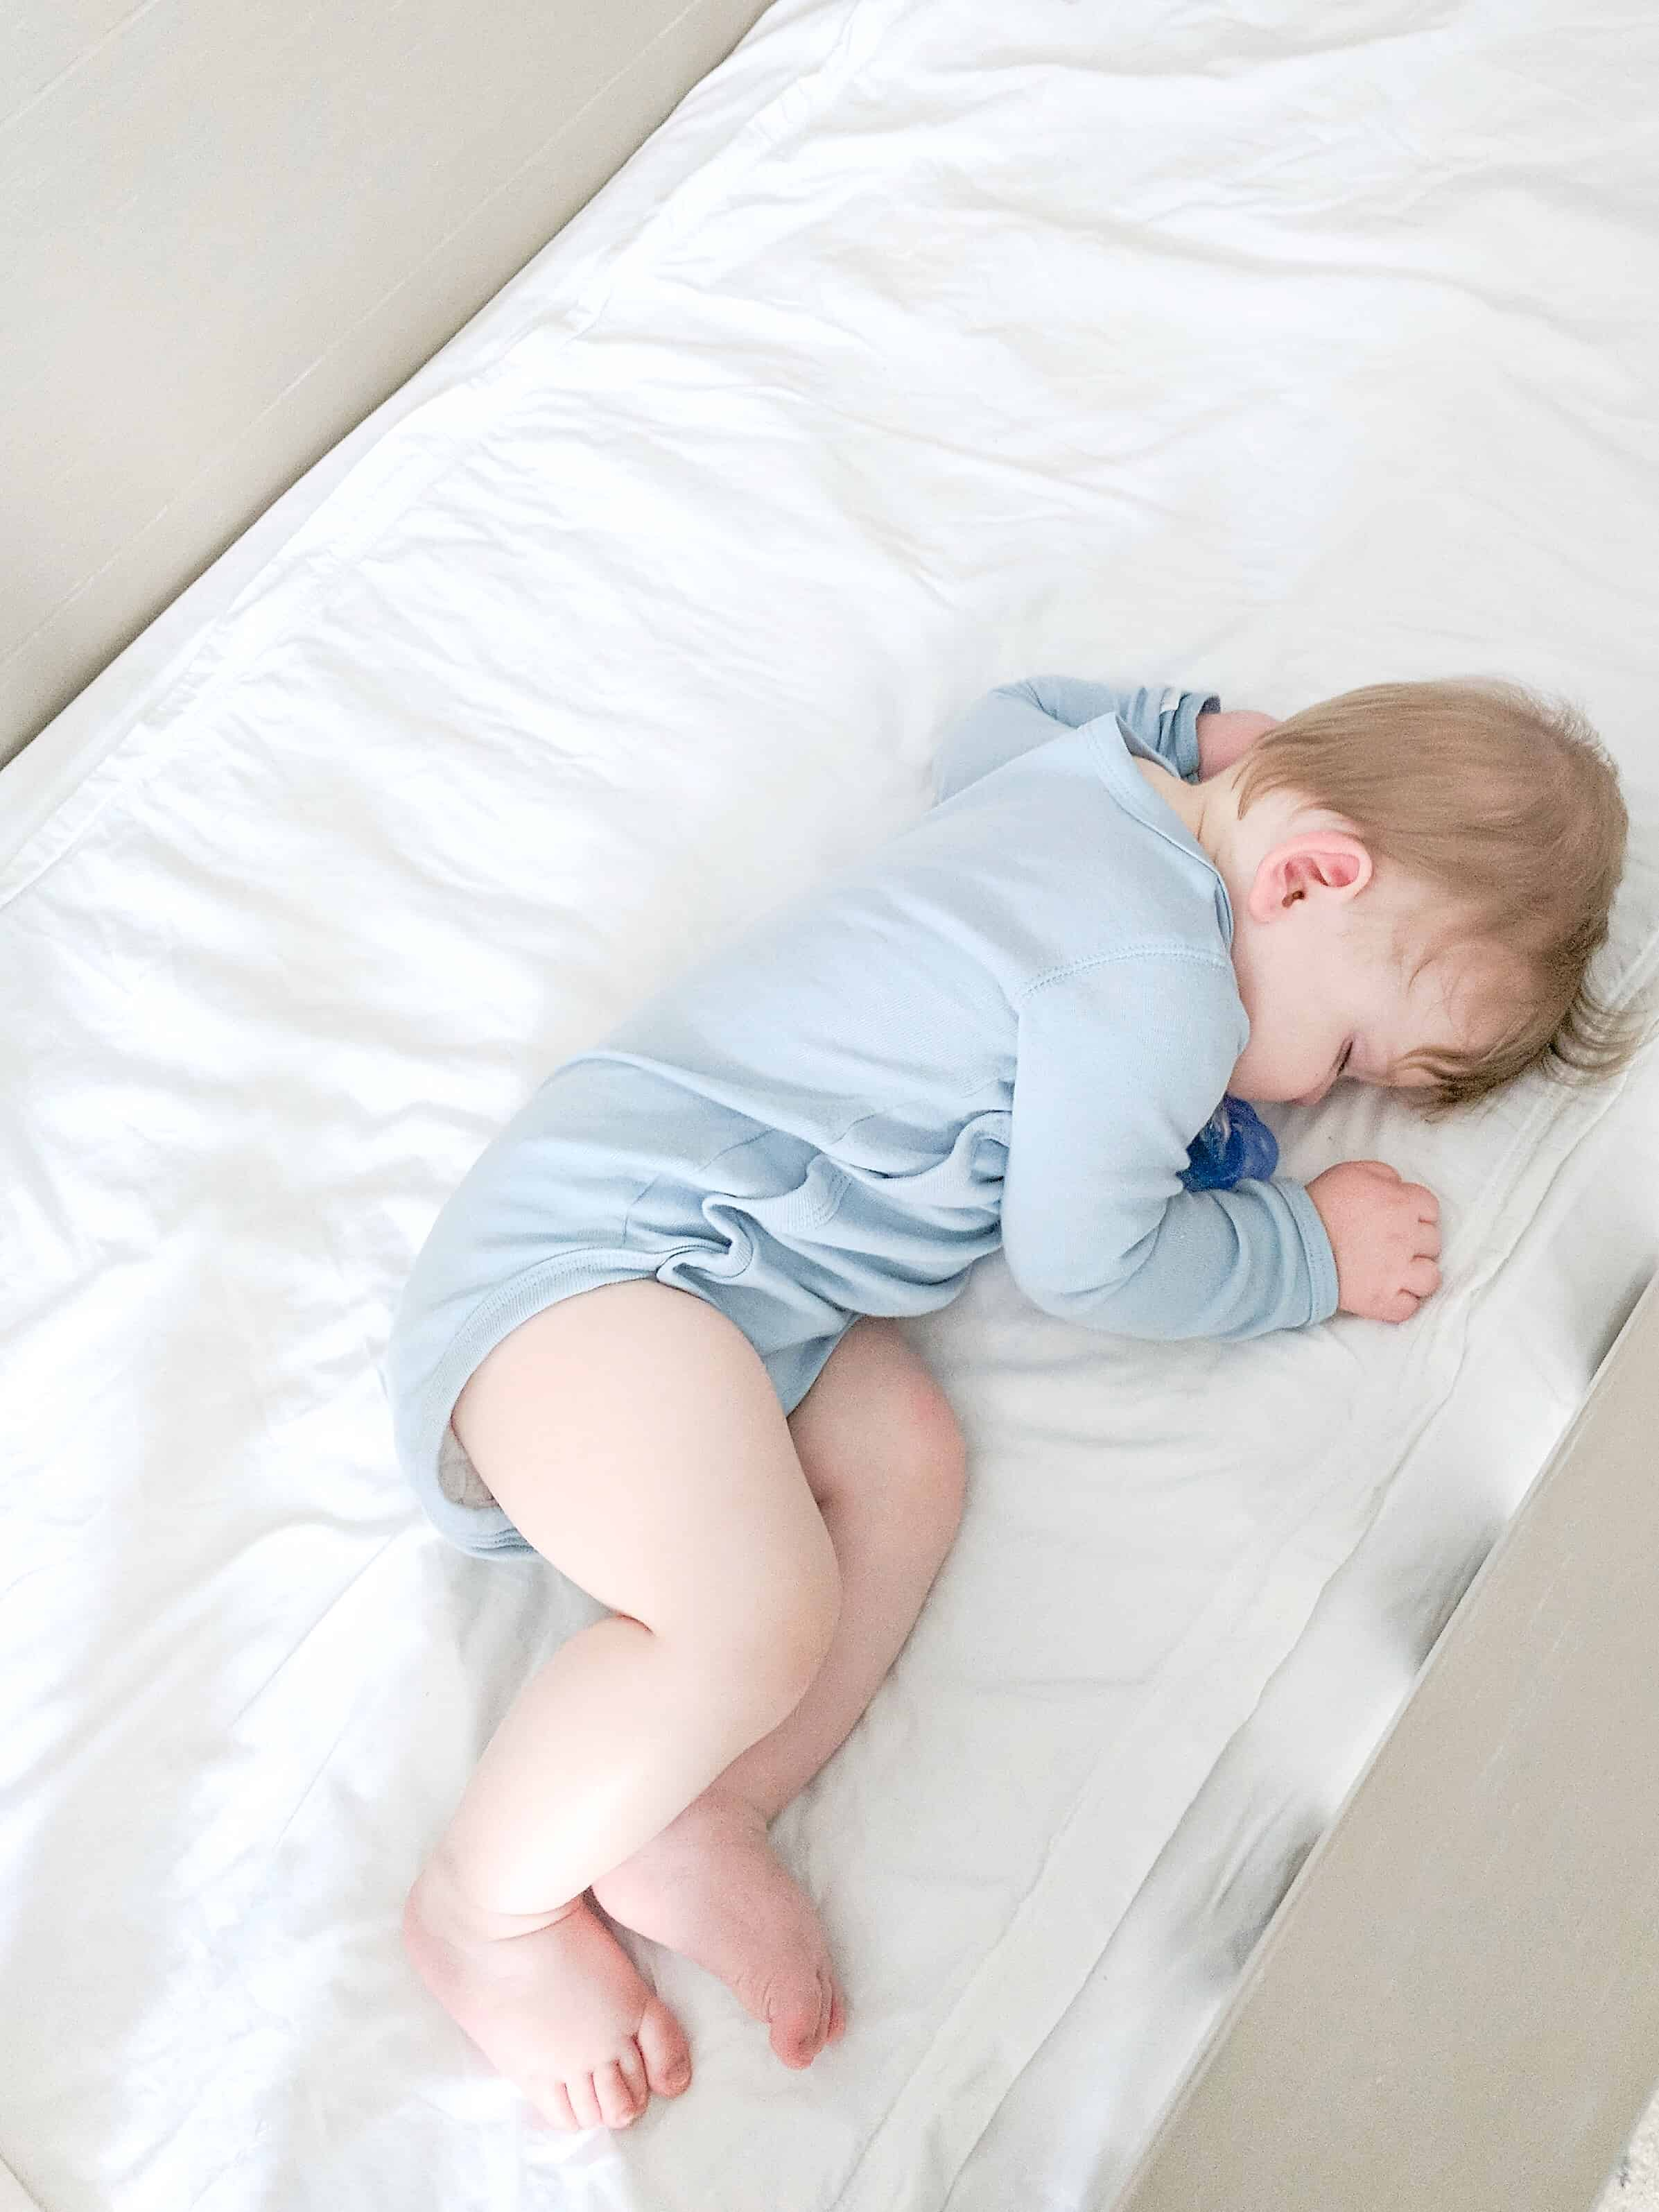 sleeping baby in blue onsie on white sheets